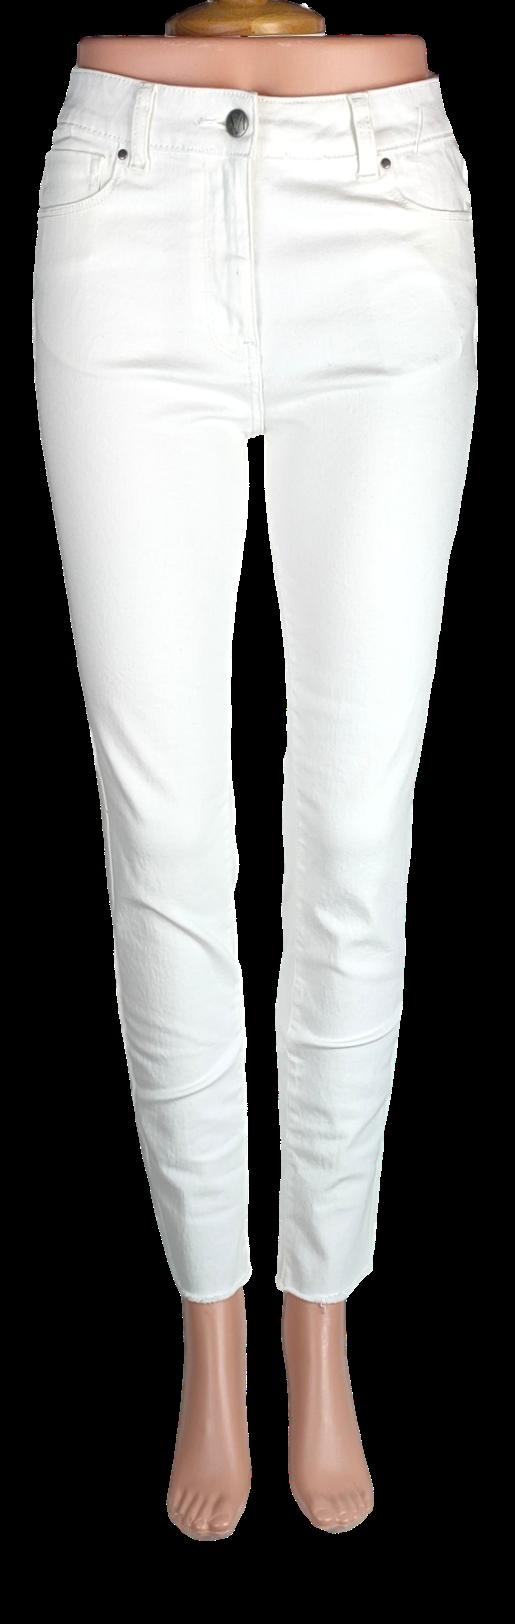 Jean Monoprix - Taille 36